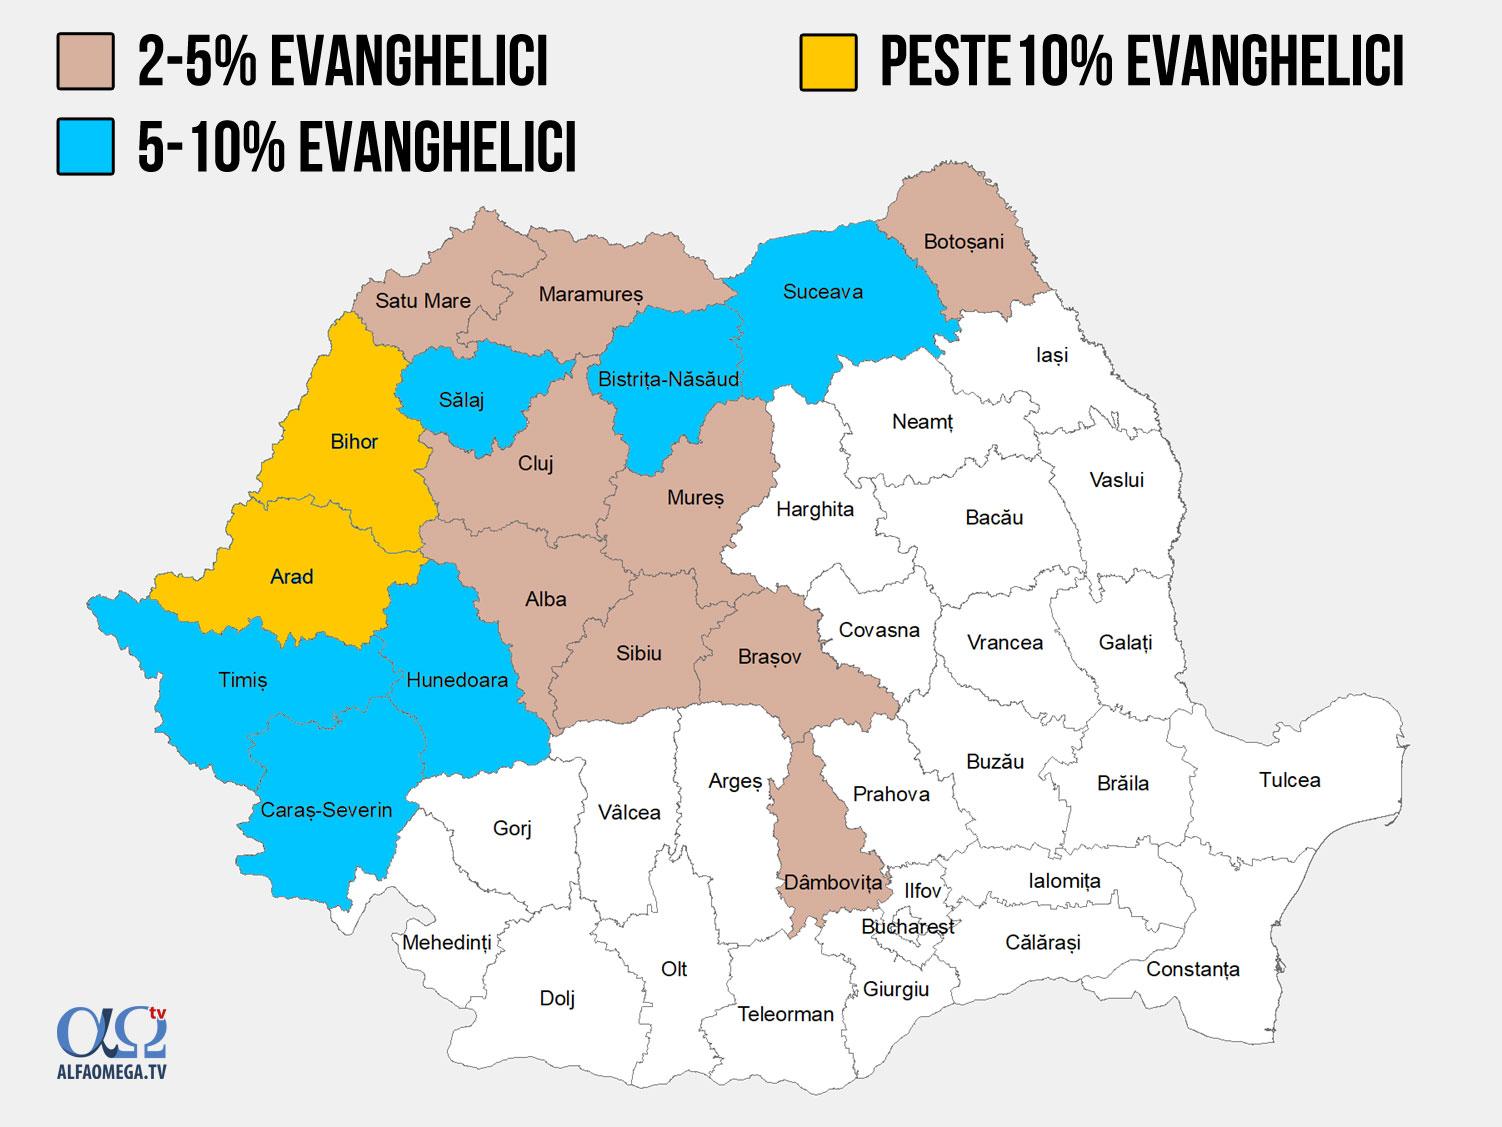 bisericile evanghelice din ro procente